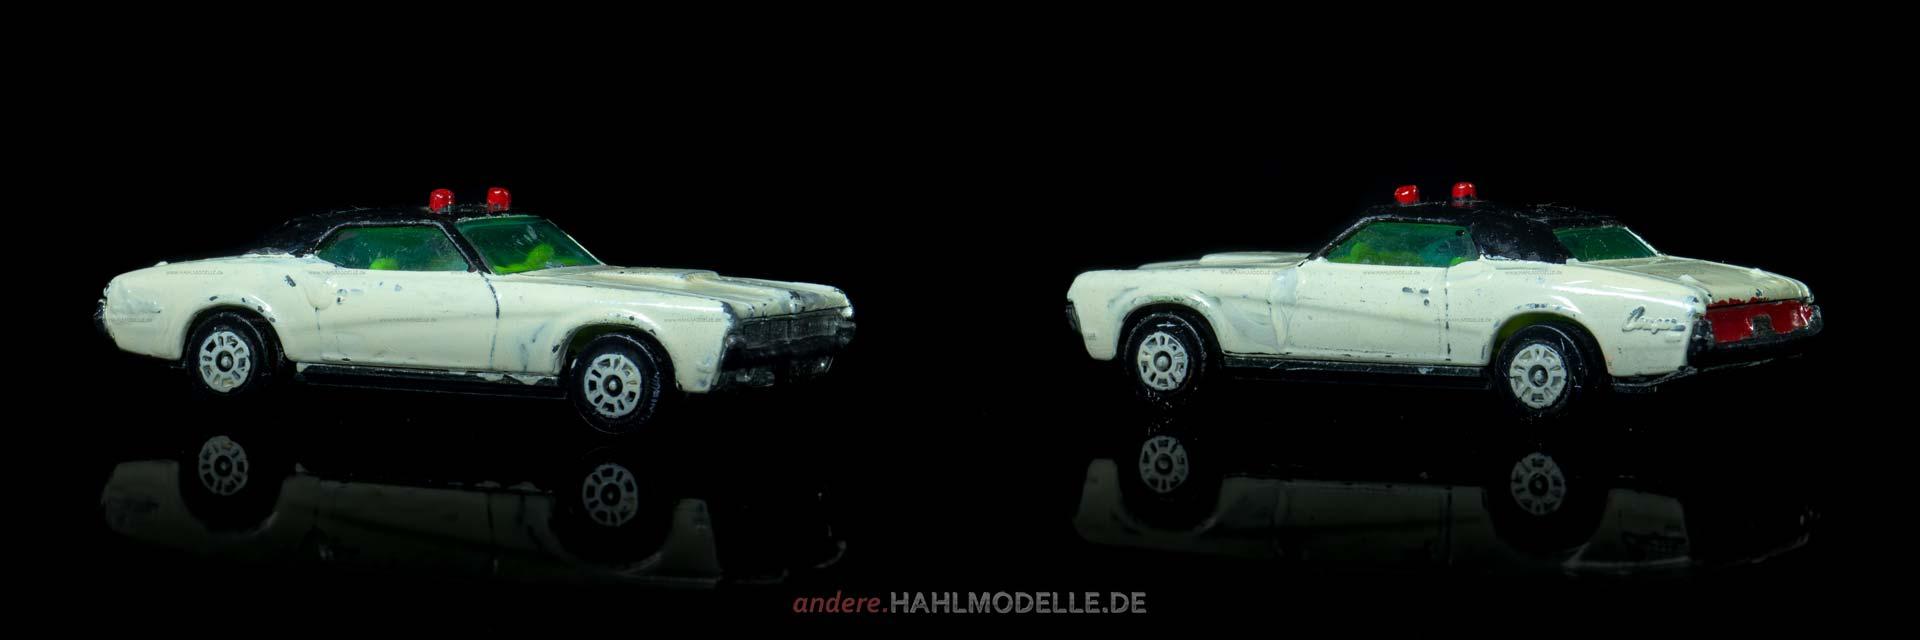 Mercury Cougar XR7 | Coupé | Mettoy Playcraft Ltd. | 1:64 | www.andere.hahlmodelle.de